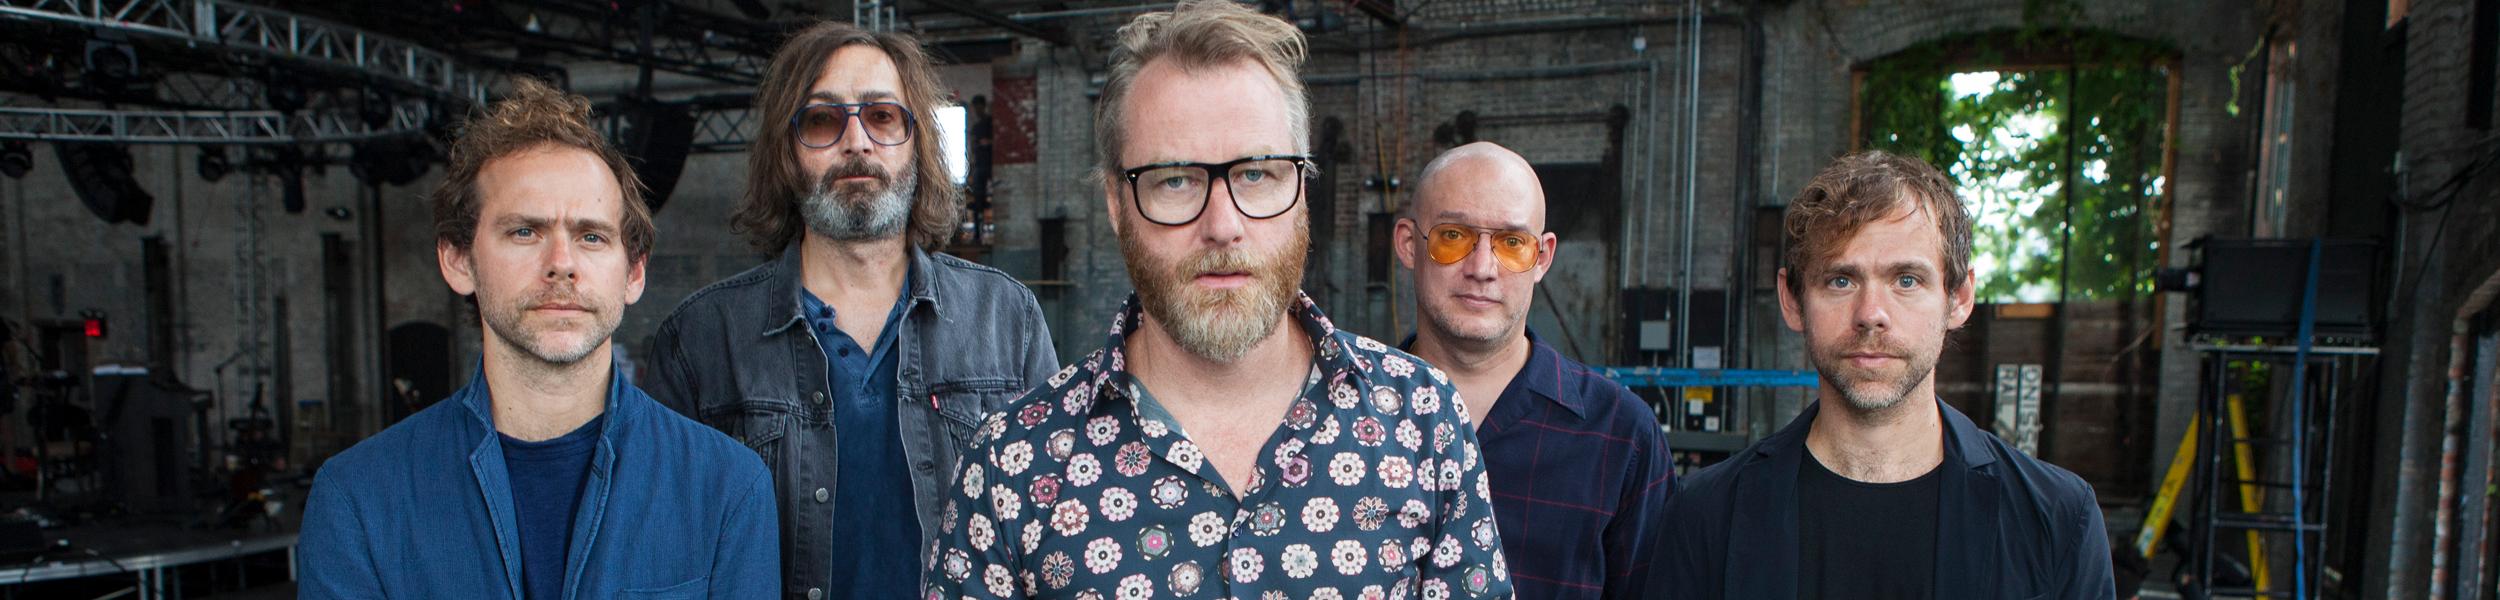 The National - 'Sleep Well Beast' wins GRAMMY for Best Alternative Music Album